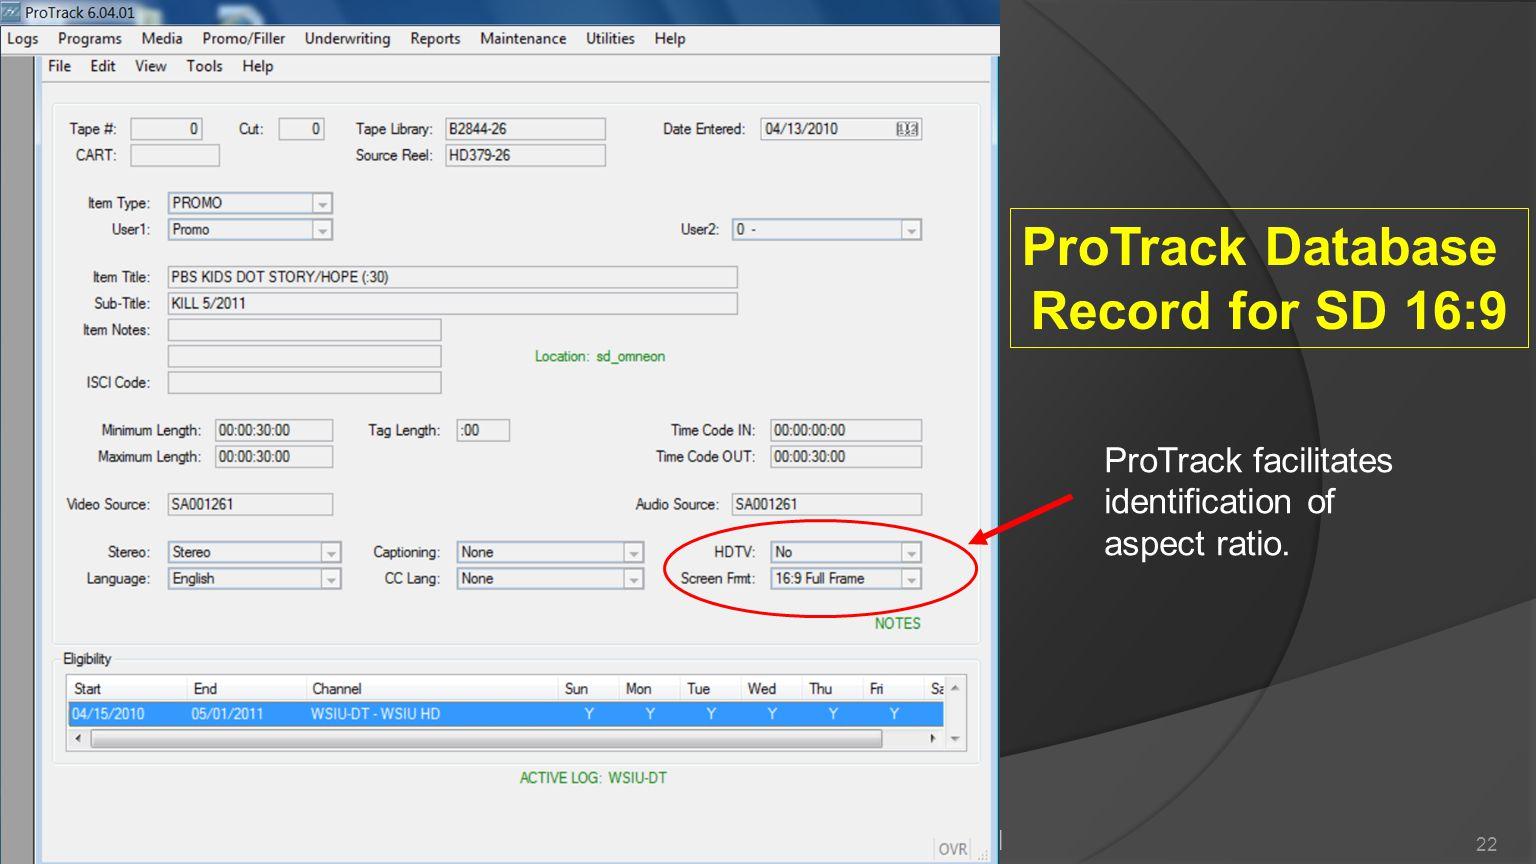 Q G NETA QG Workshop January 13, 2011 22 ProTrack facilitates identification of aspect ratio. ProTrack Database Record for SD 16:9